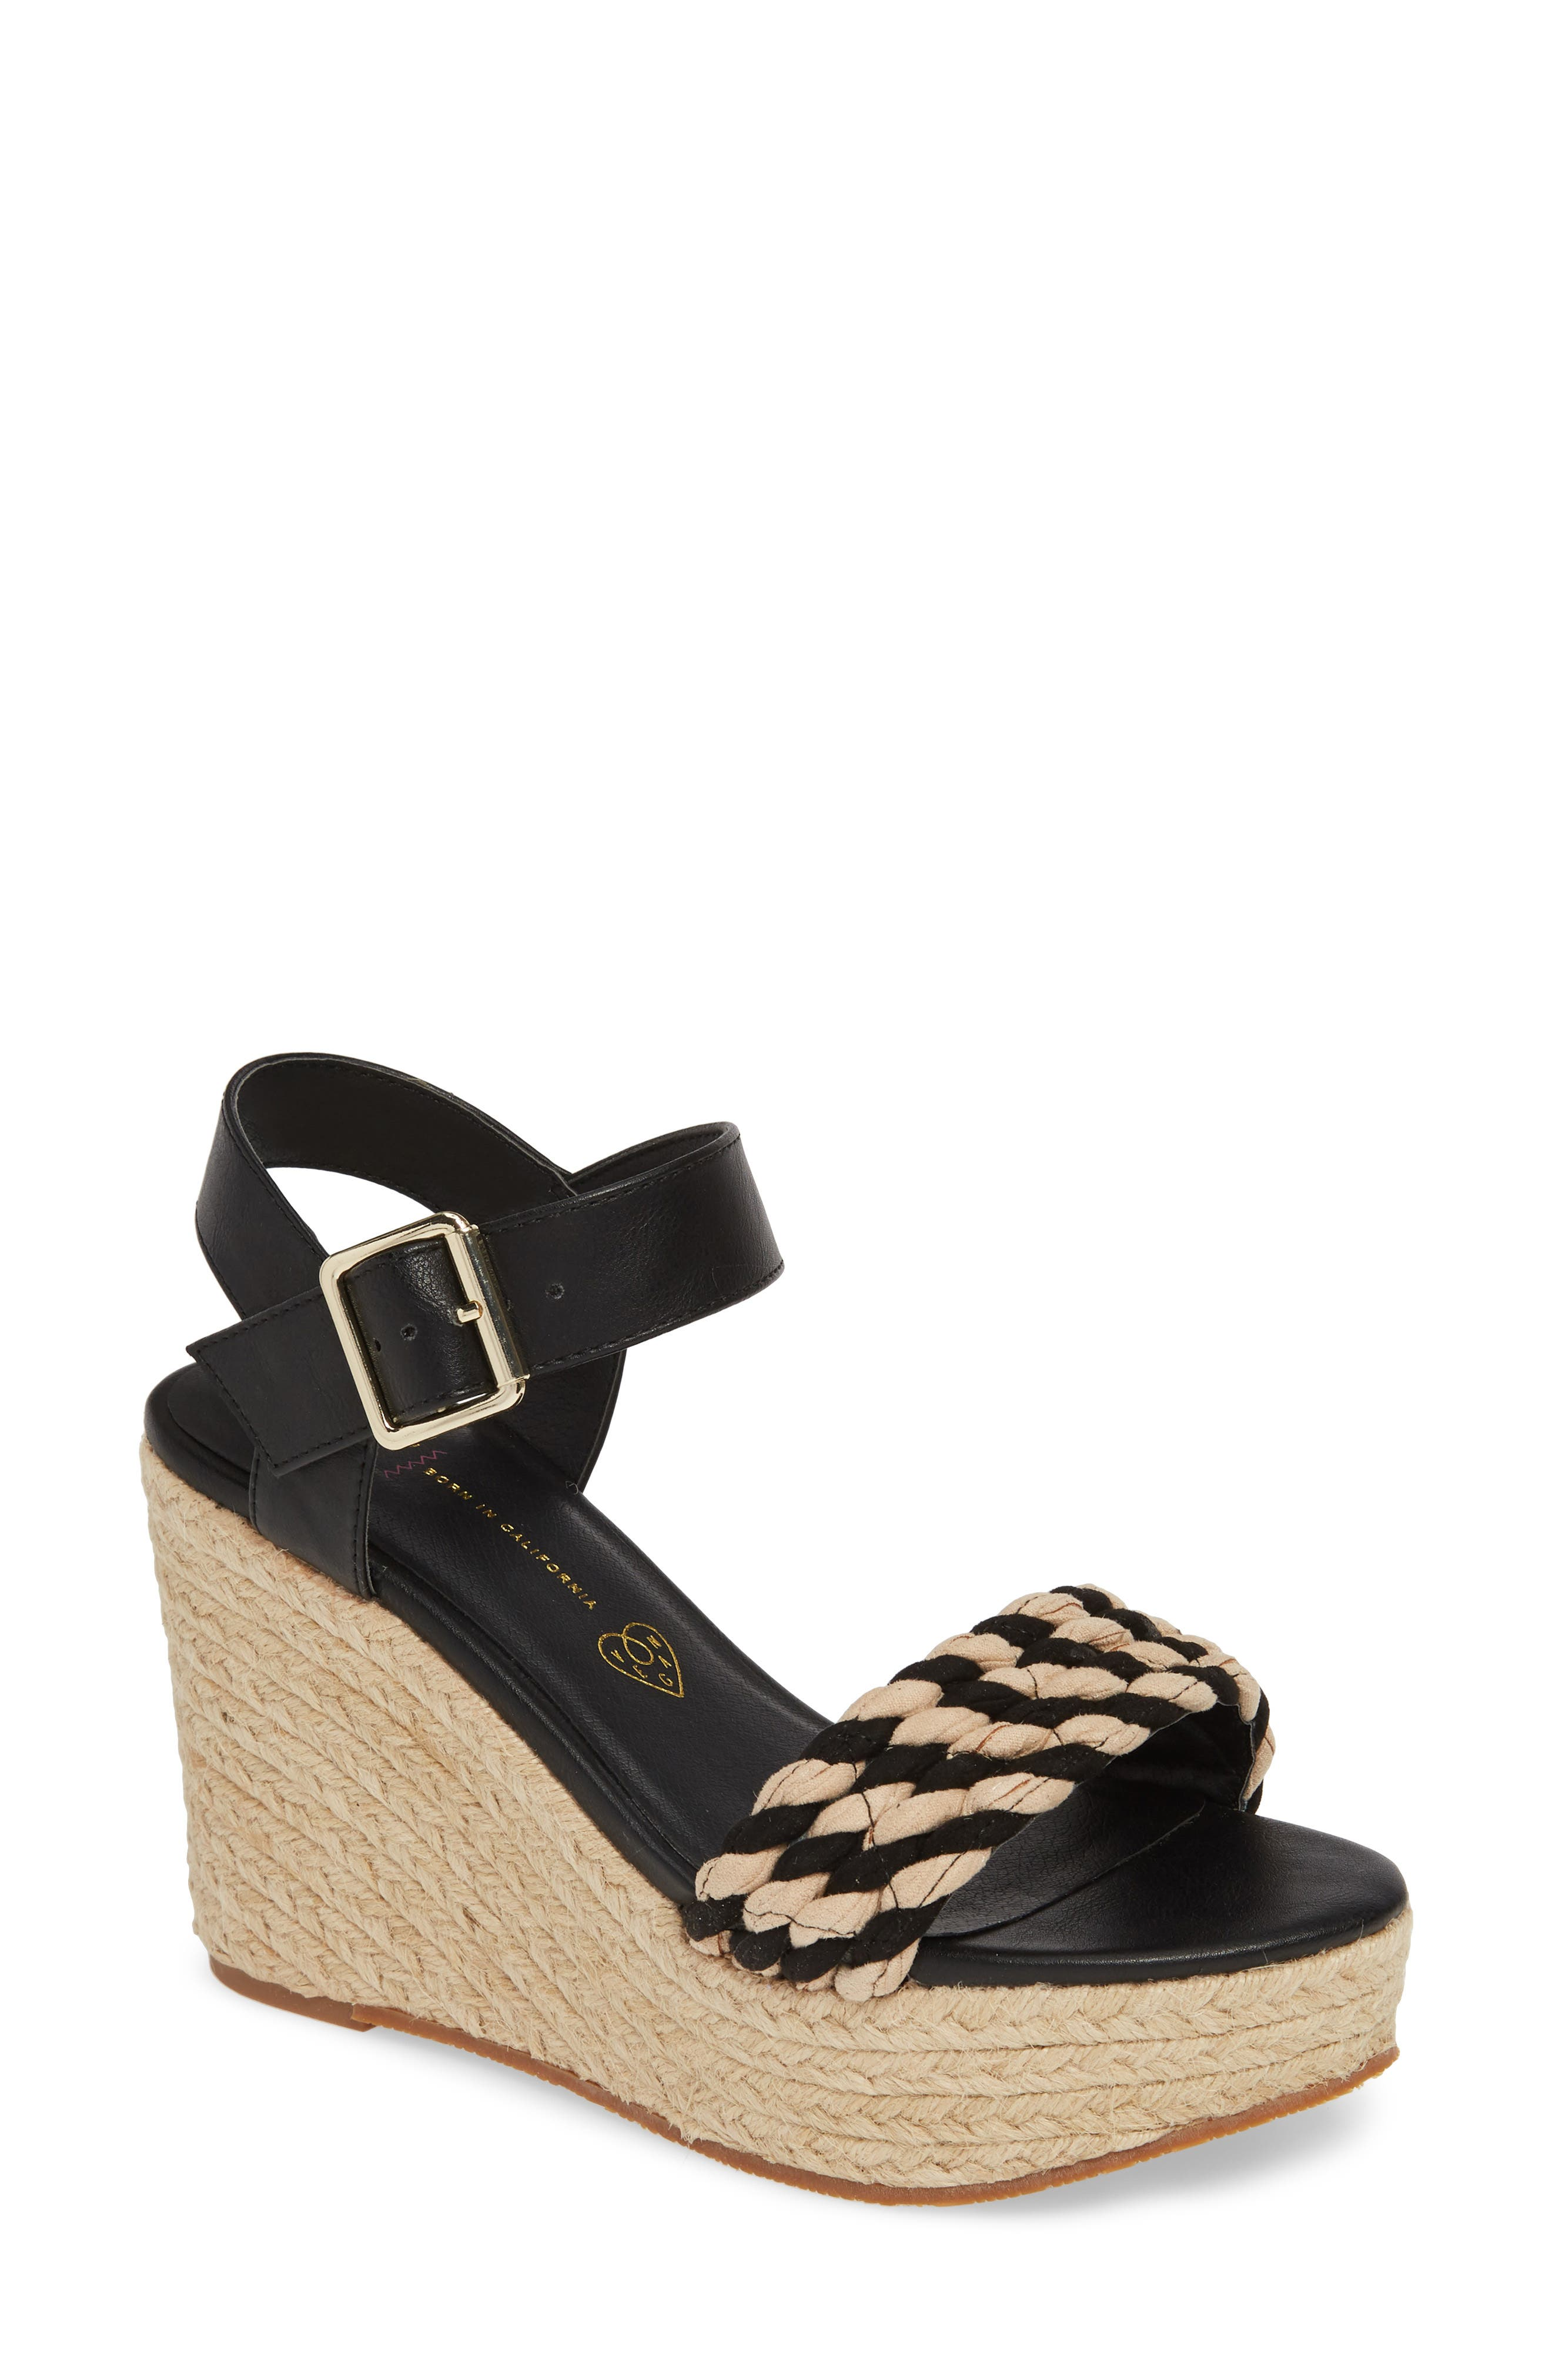 0ca193ce99f3 Bc Footwear Dew Drops Vegan Espadrille Wedge Sandal- Black